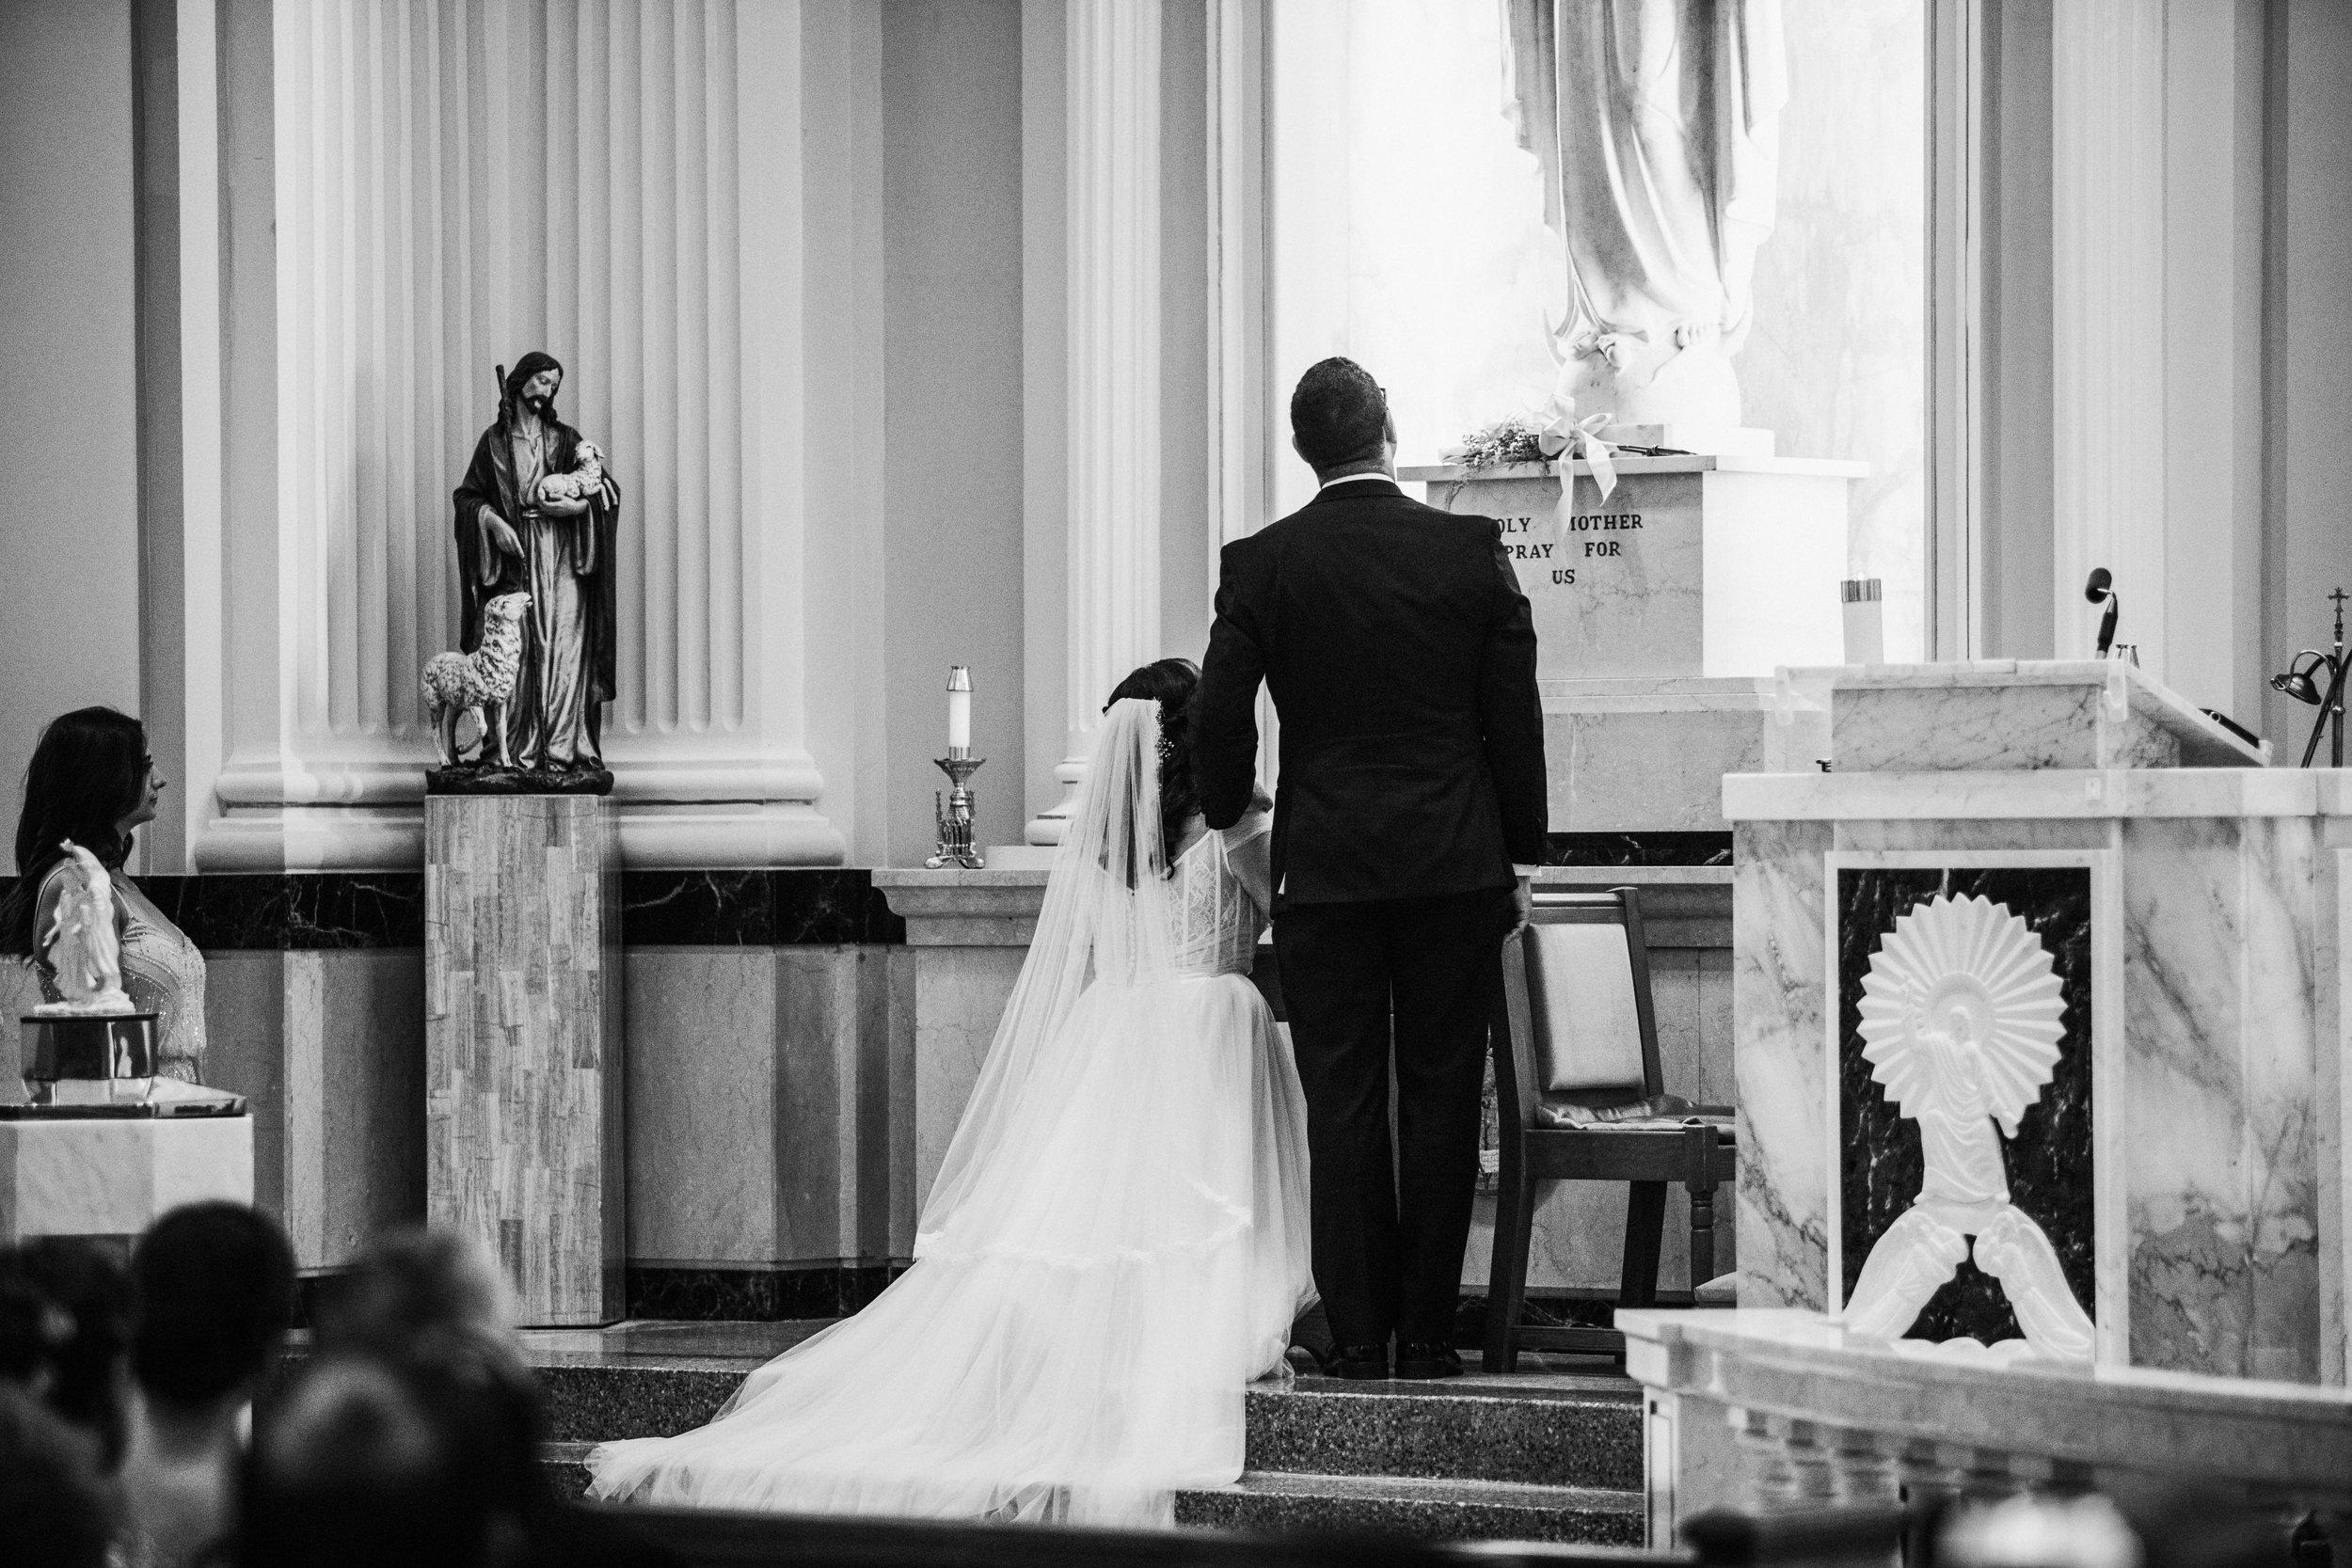 JennaLynnPhotography-NJWeddingPhotographer-Philadelphia-Wedding-ArtsBallroom-CeremonyBW-124.jpg